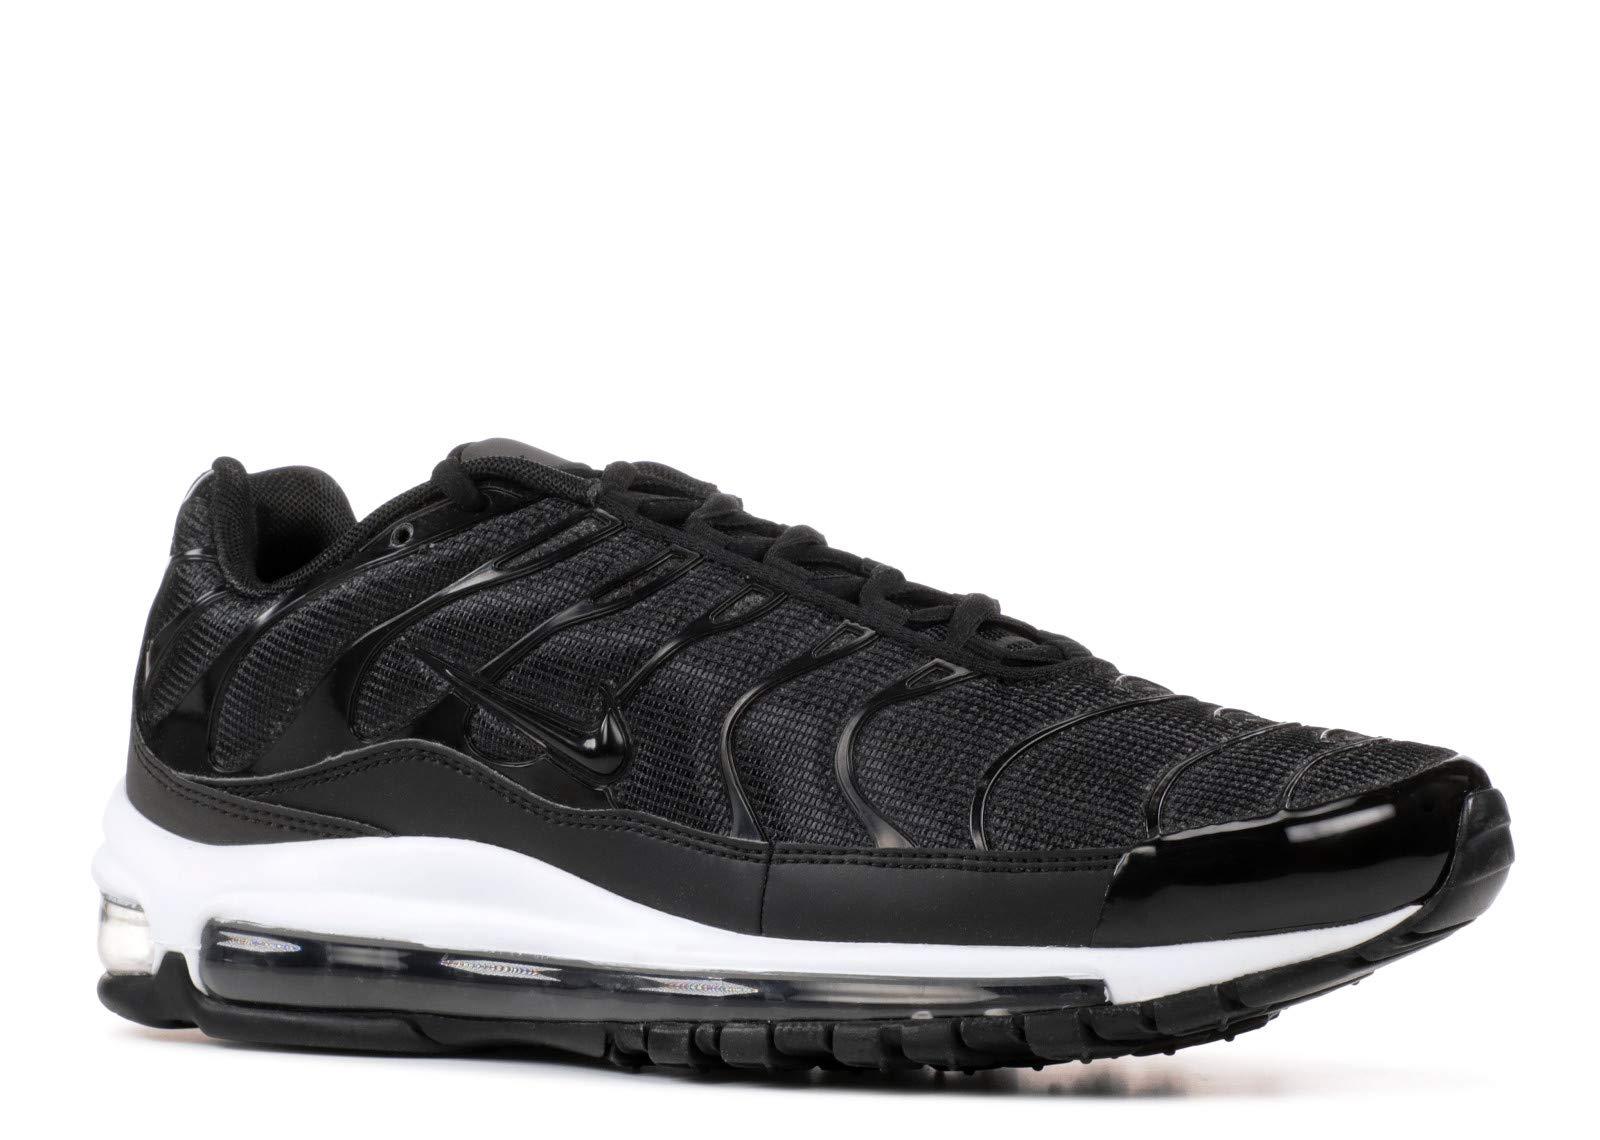 Nike Air Max 97 Plus Mens Running Trainers Ah8144 Sneakers Shoes